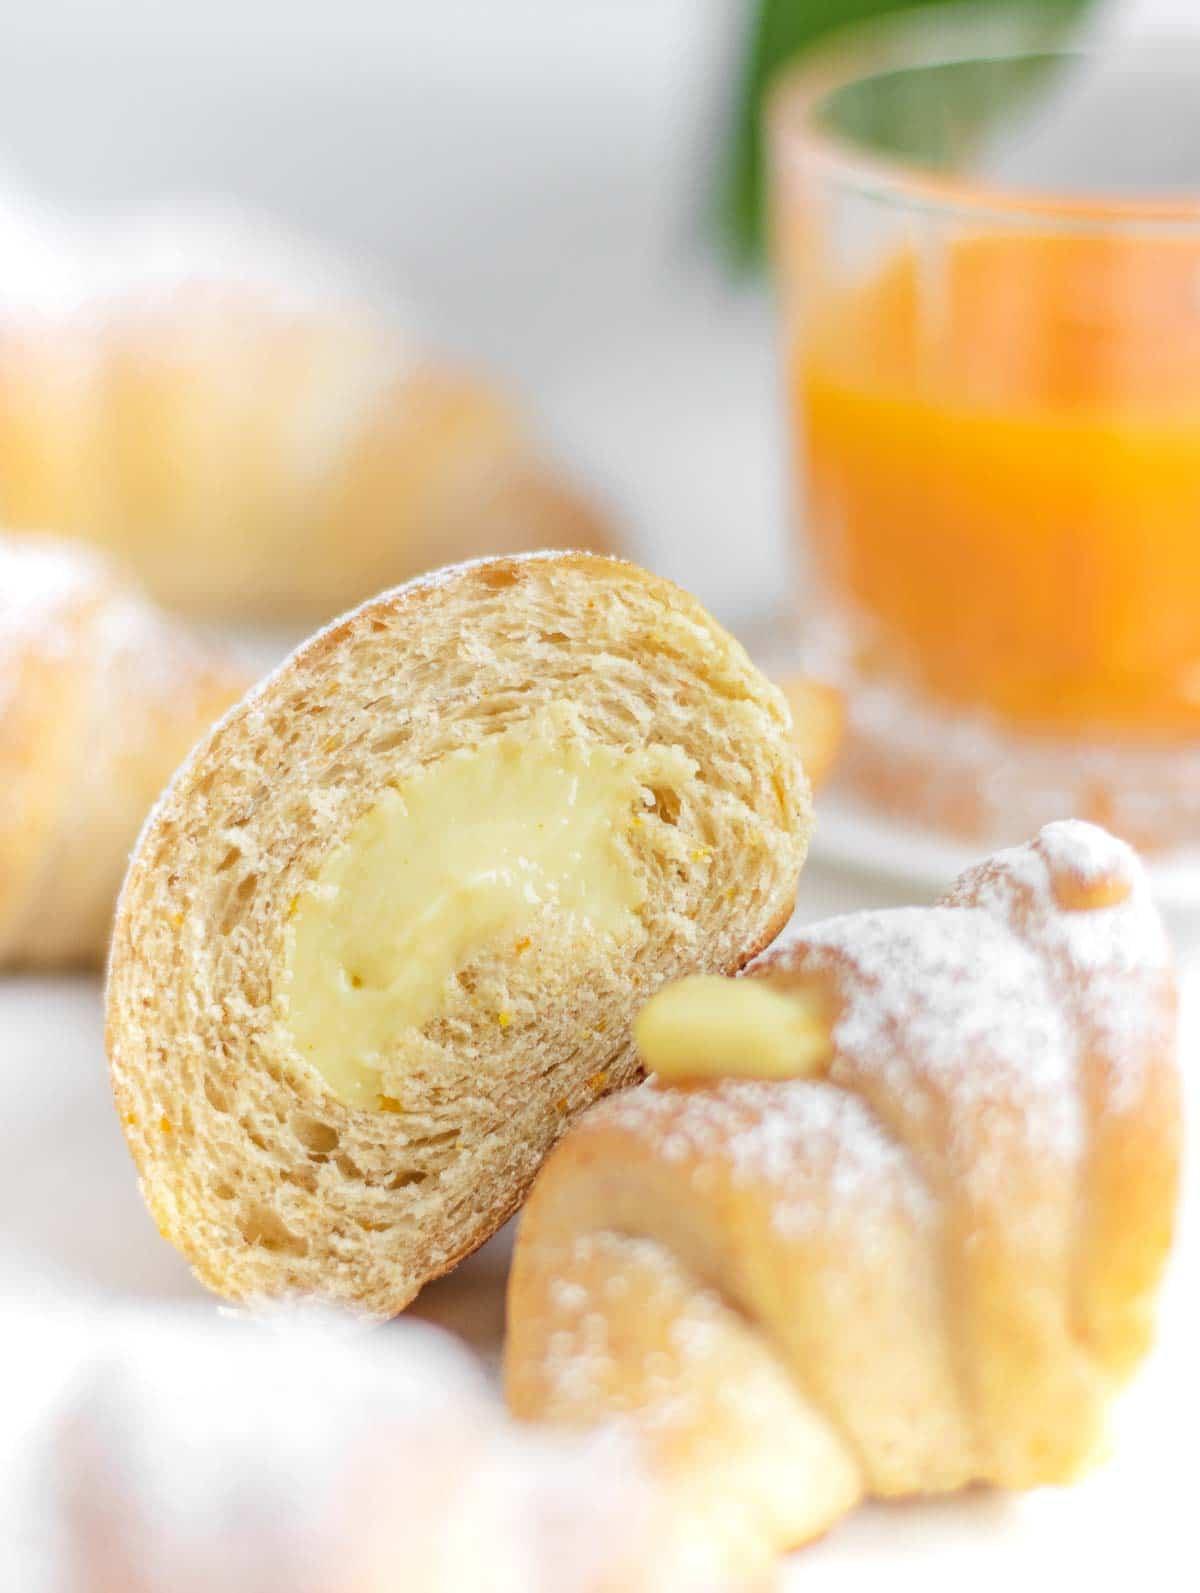 cornetti - Italian croissant zoomed in